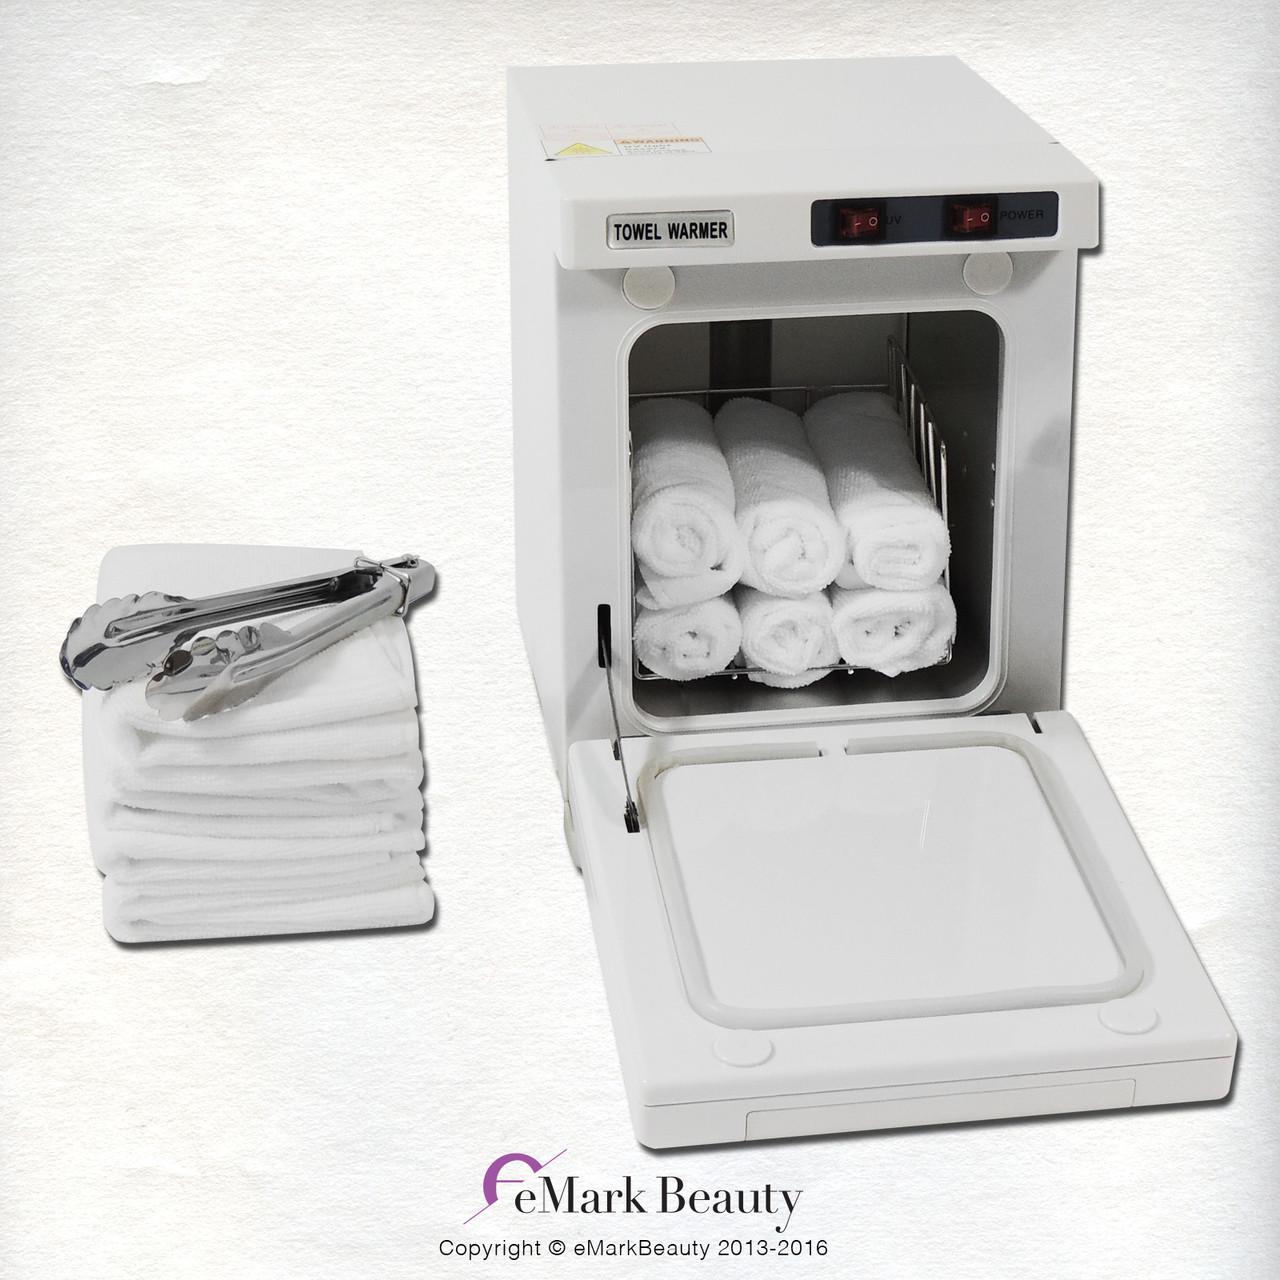 mini hot towel warmer cabinet uv sterilizer 12 free towels facial nail spa beauty salon equipment